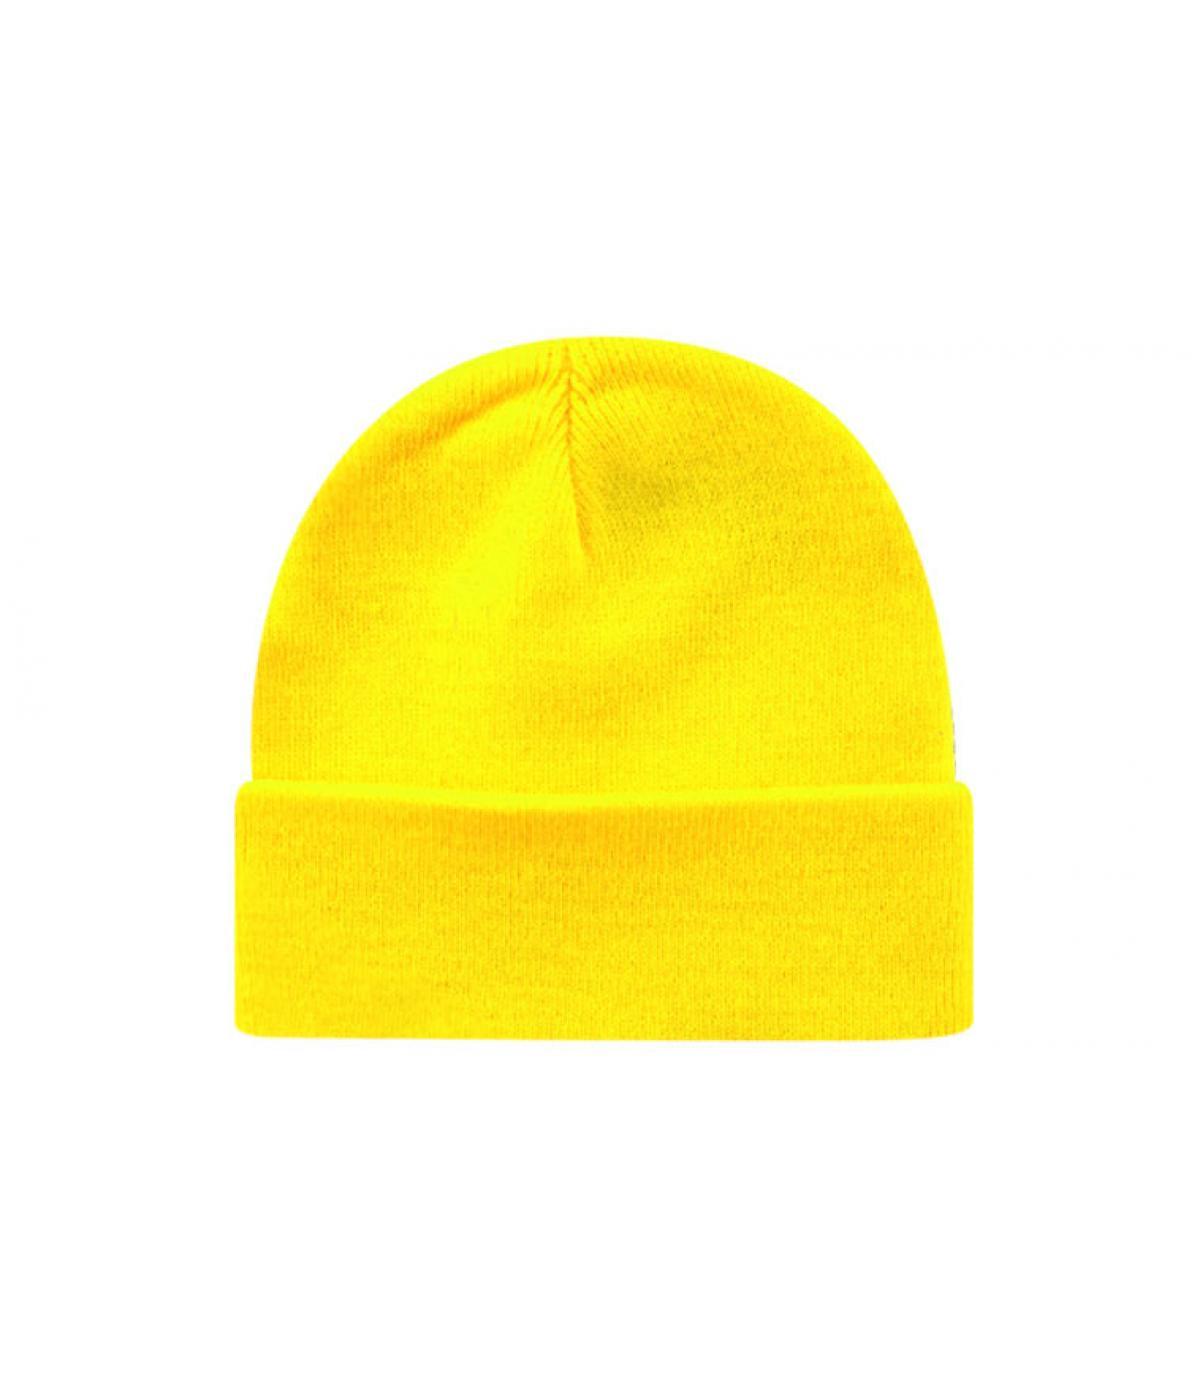 Bonnet blank jaune